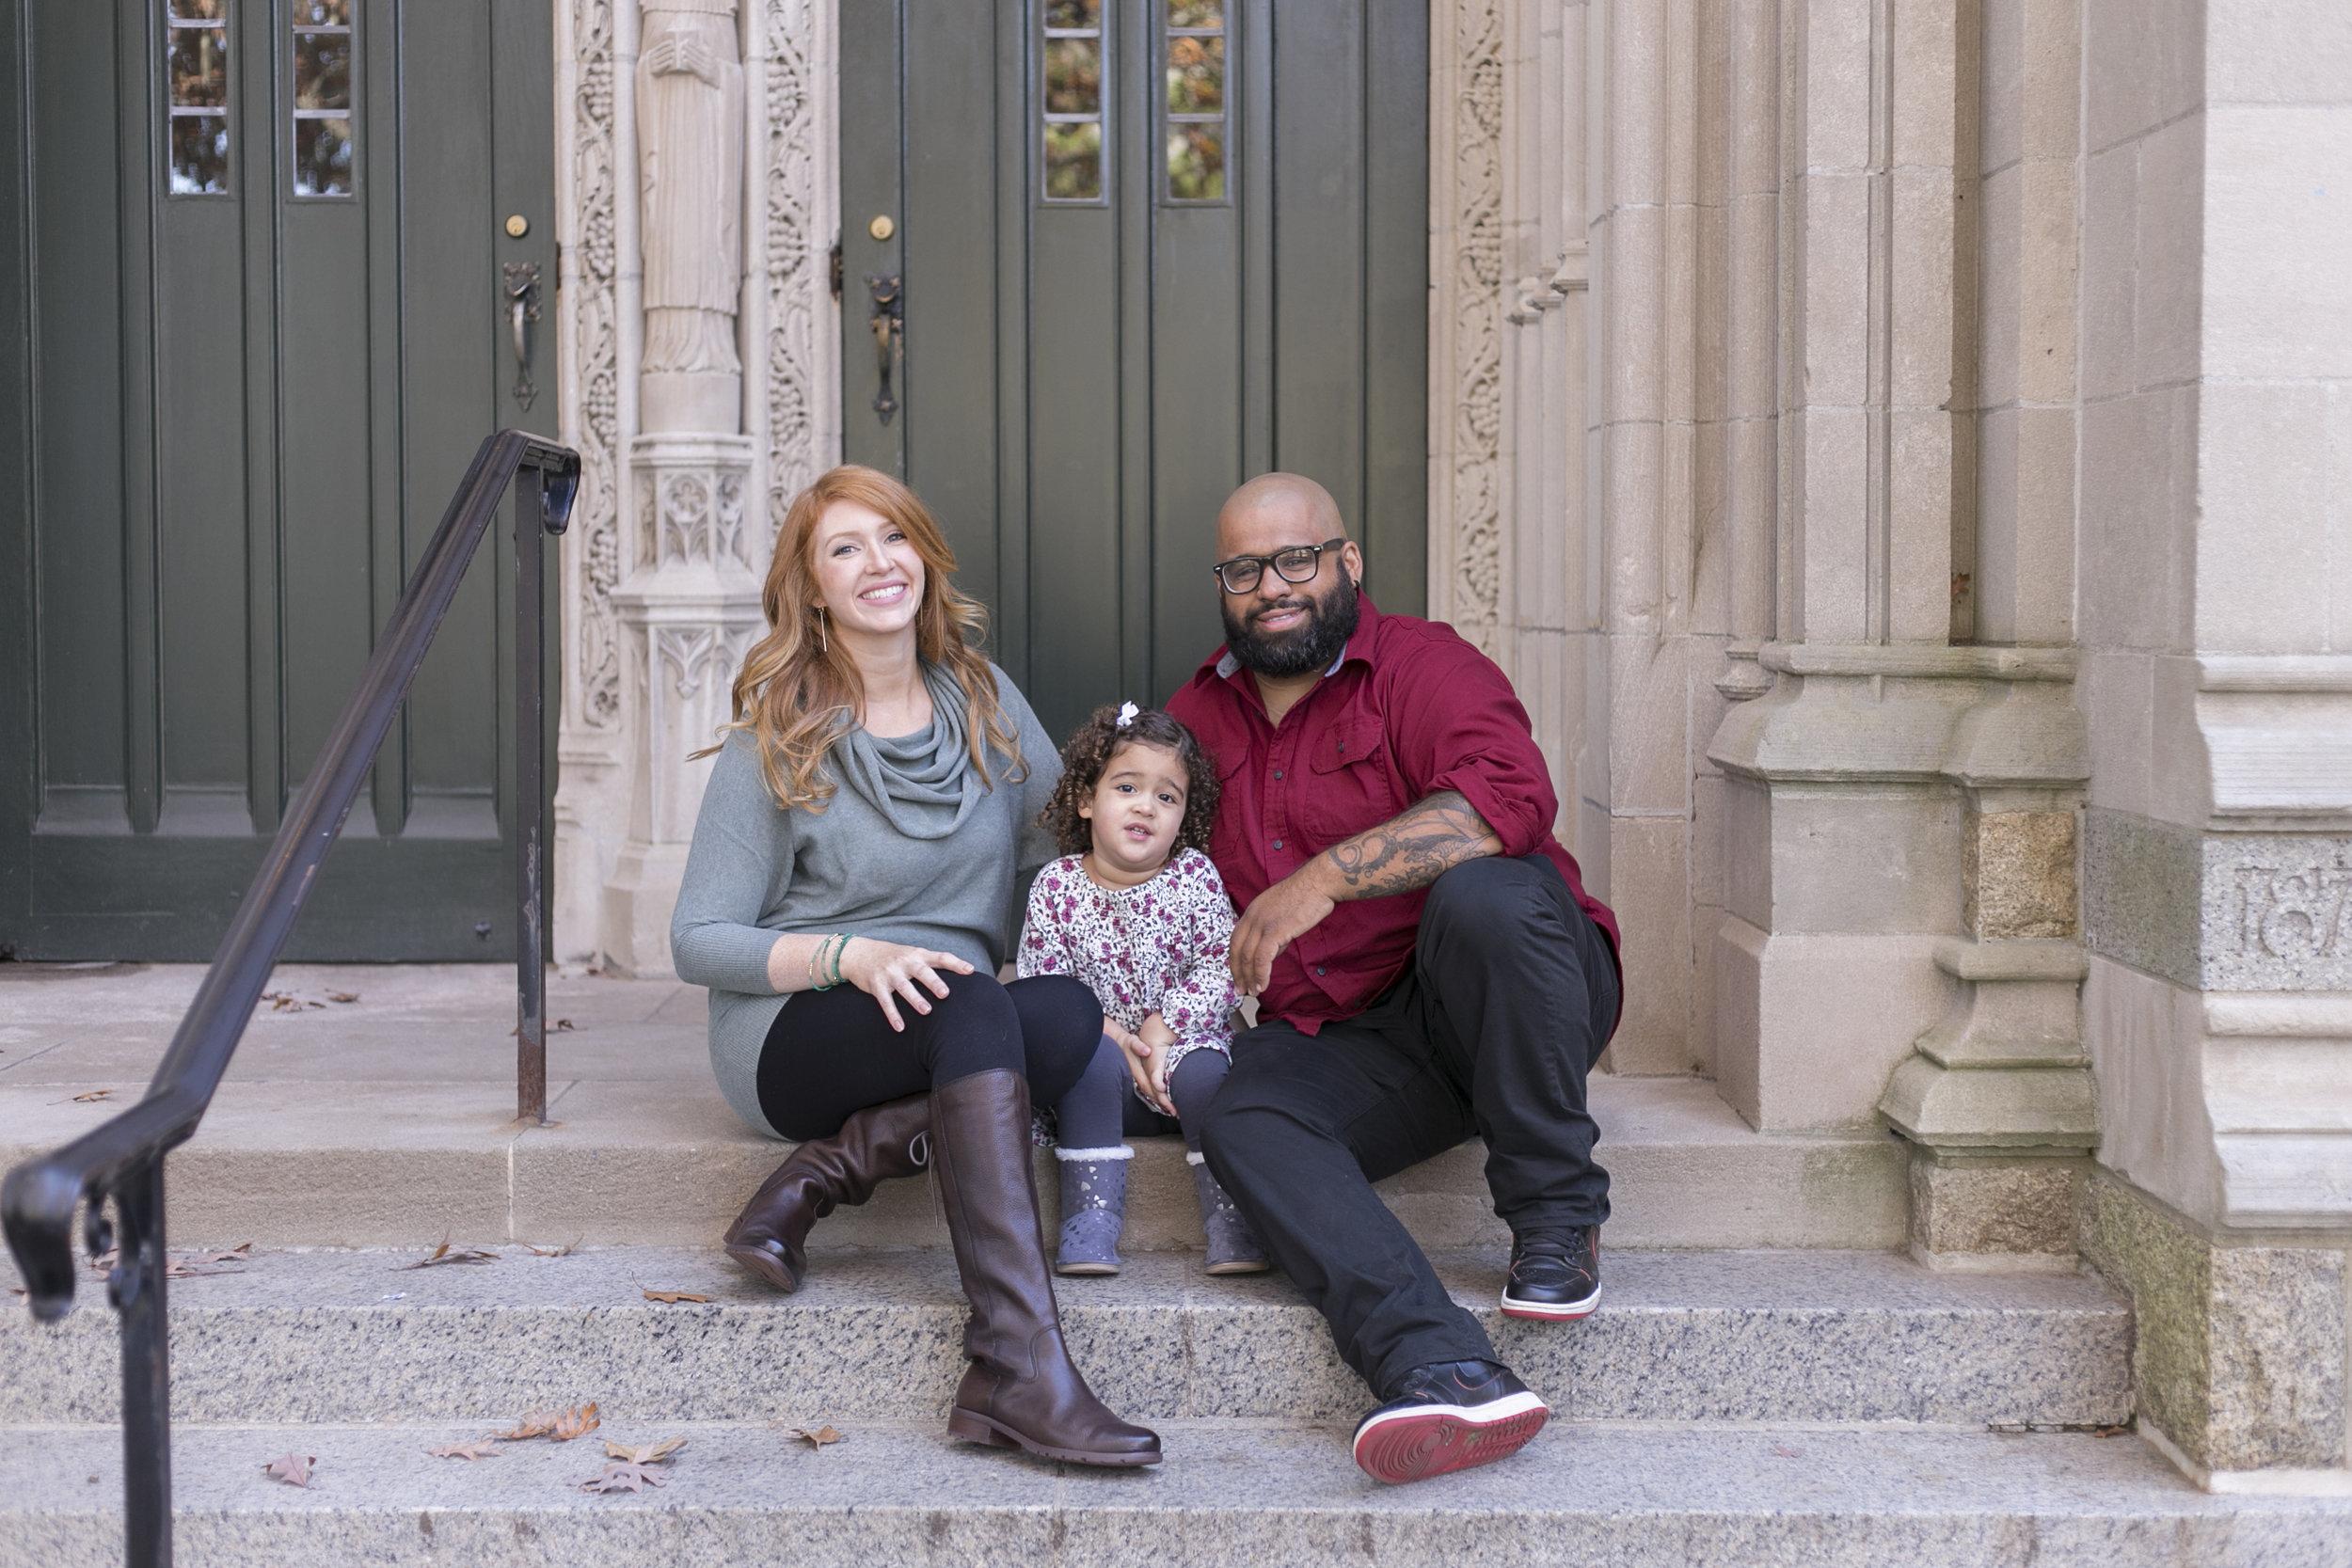 wellesley_college_family_photos_boston_new_england_photographer_erica_pezente_photography_photo-34.jpg